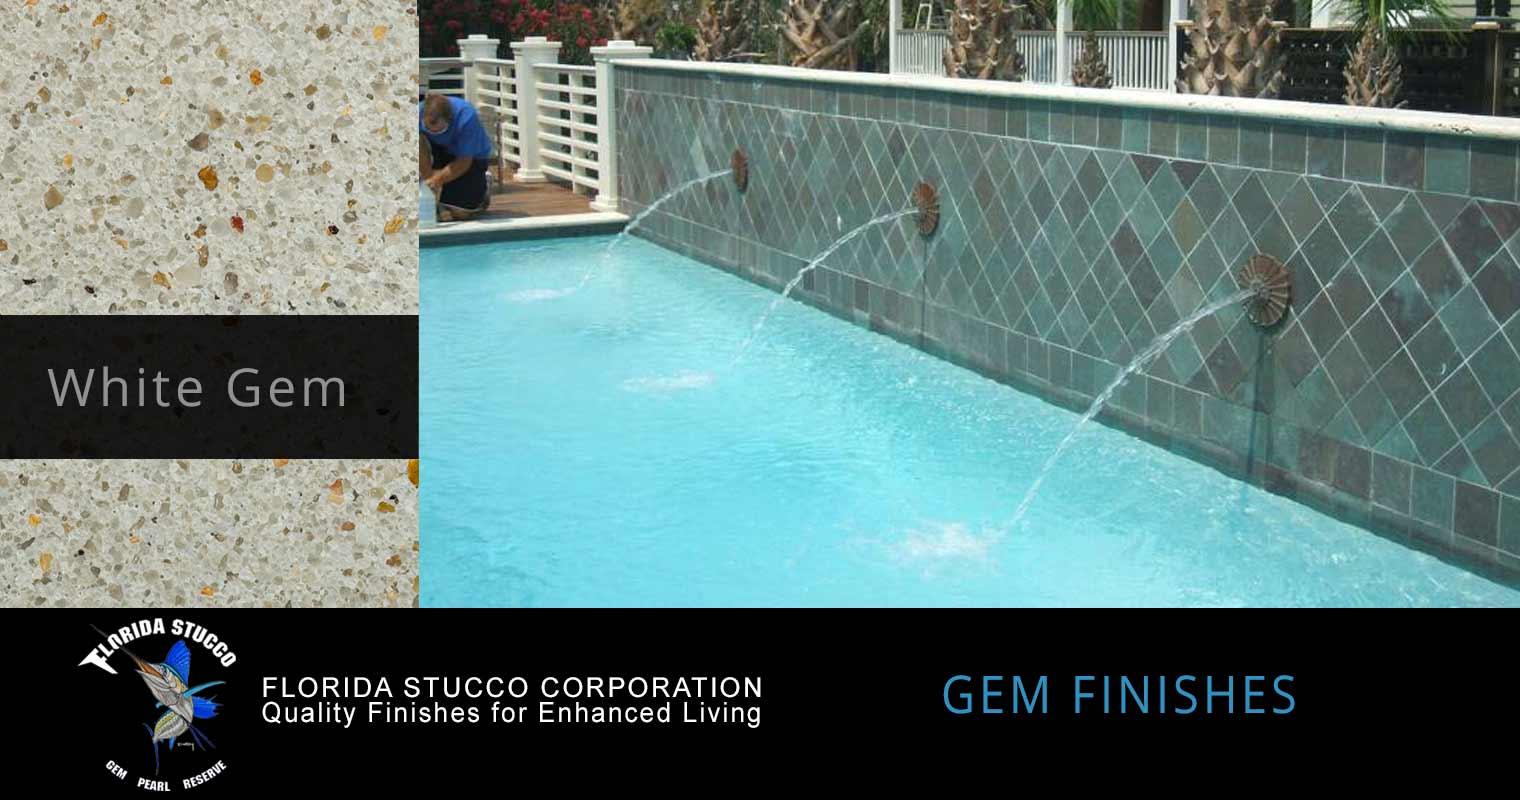 Florida Stucco - White Gem Plastering Finish Pool Sample 1